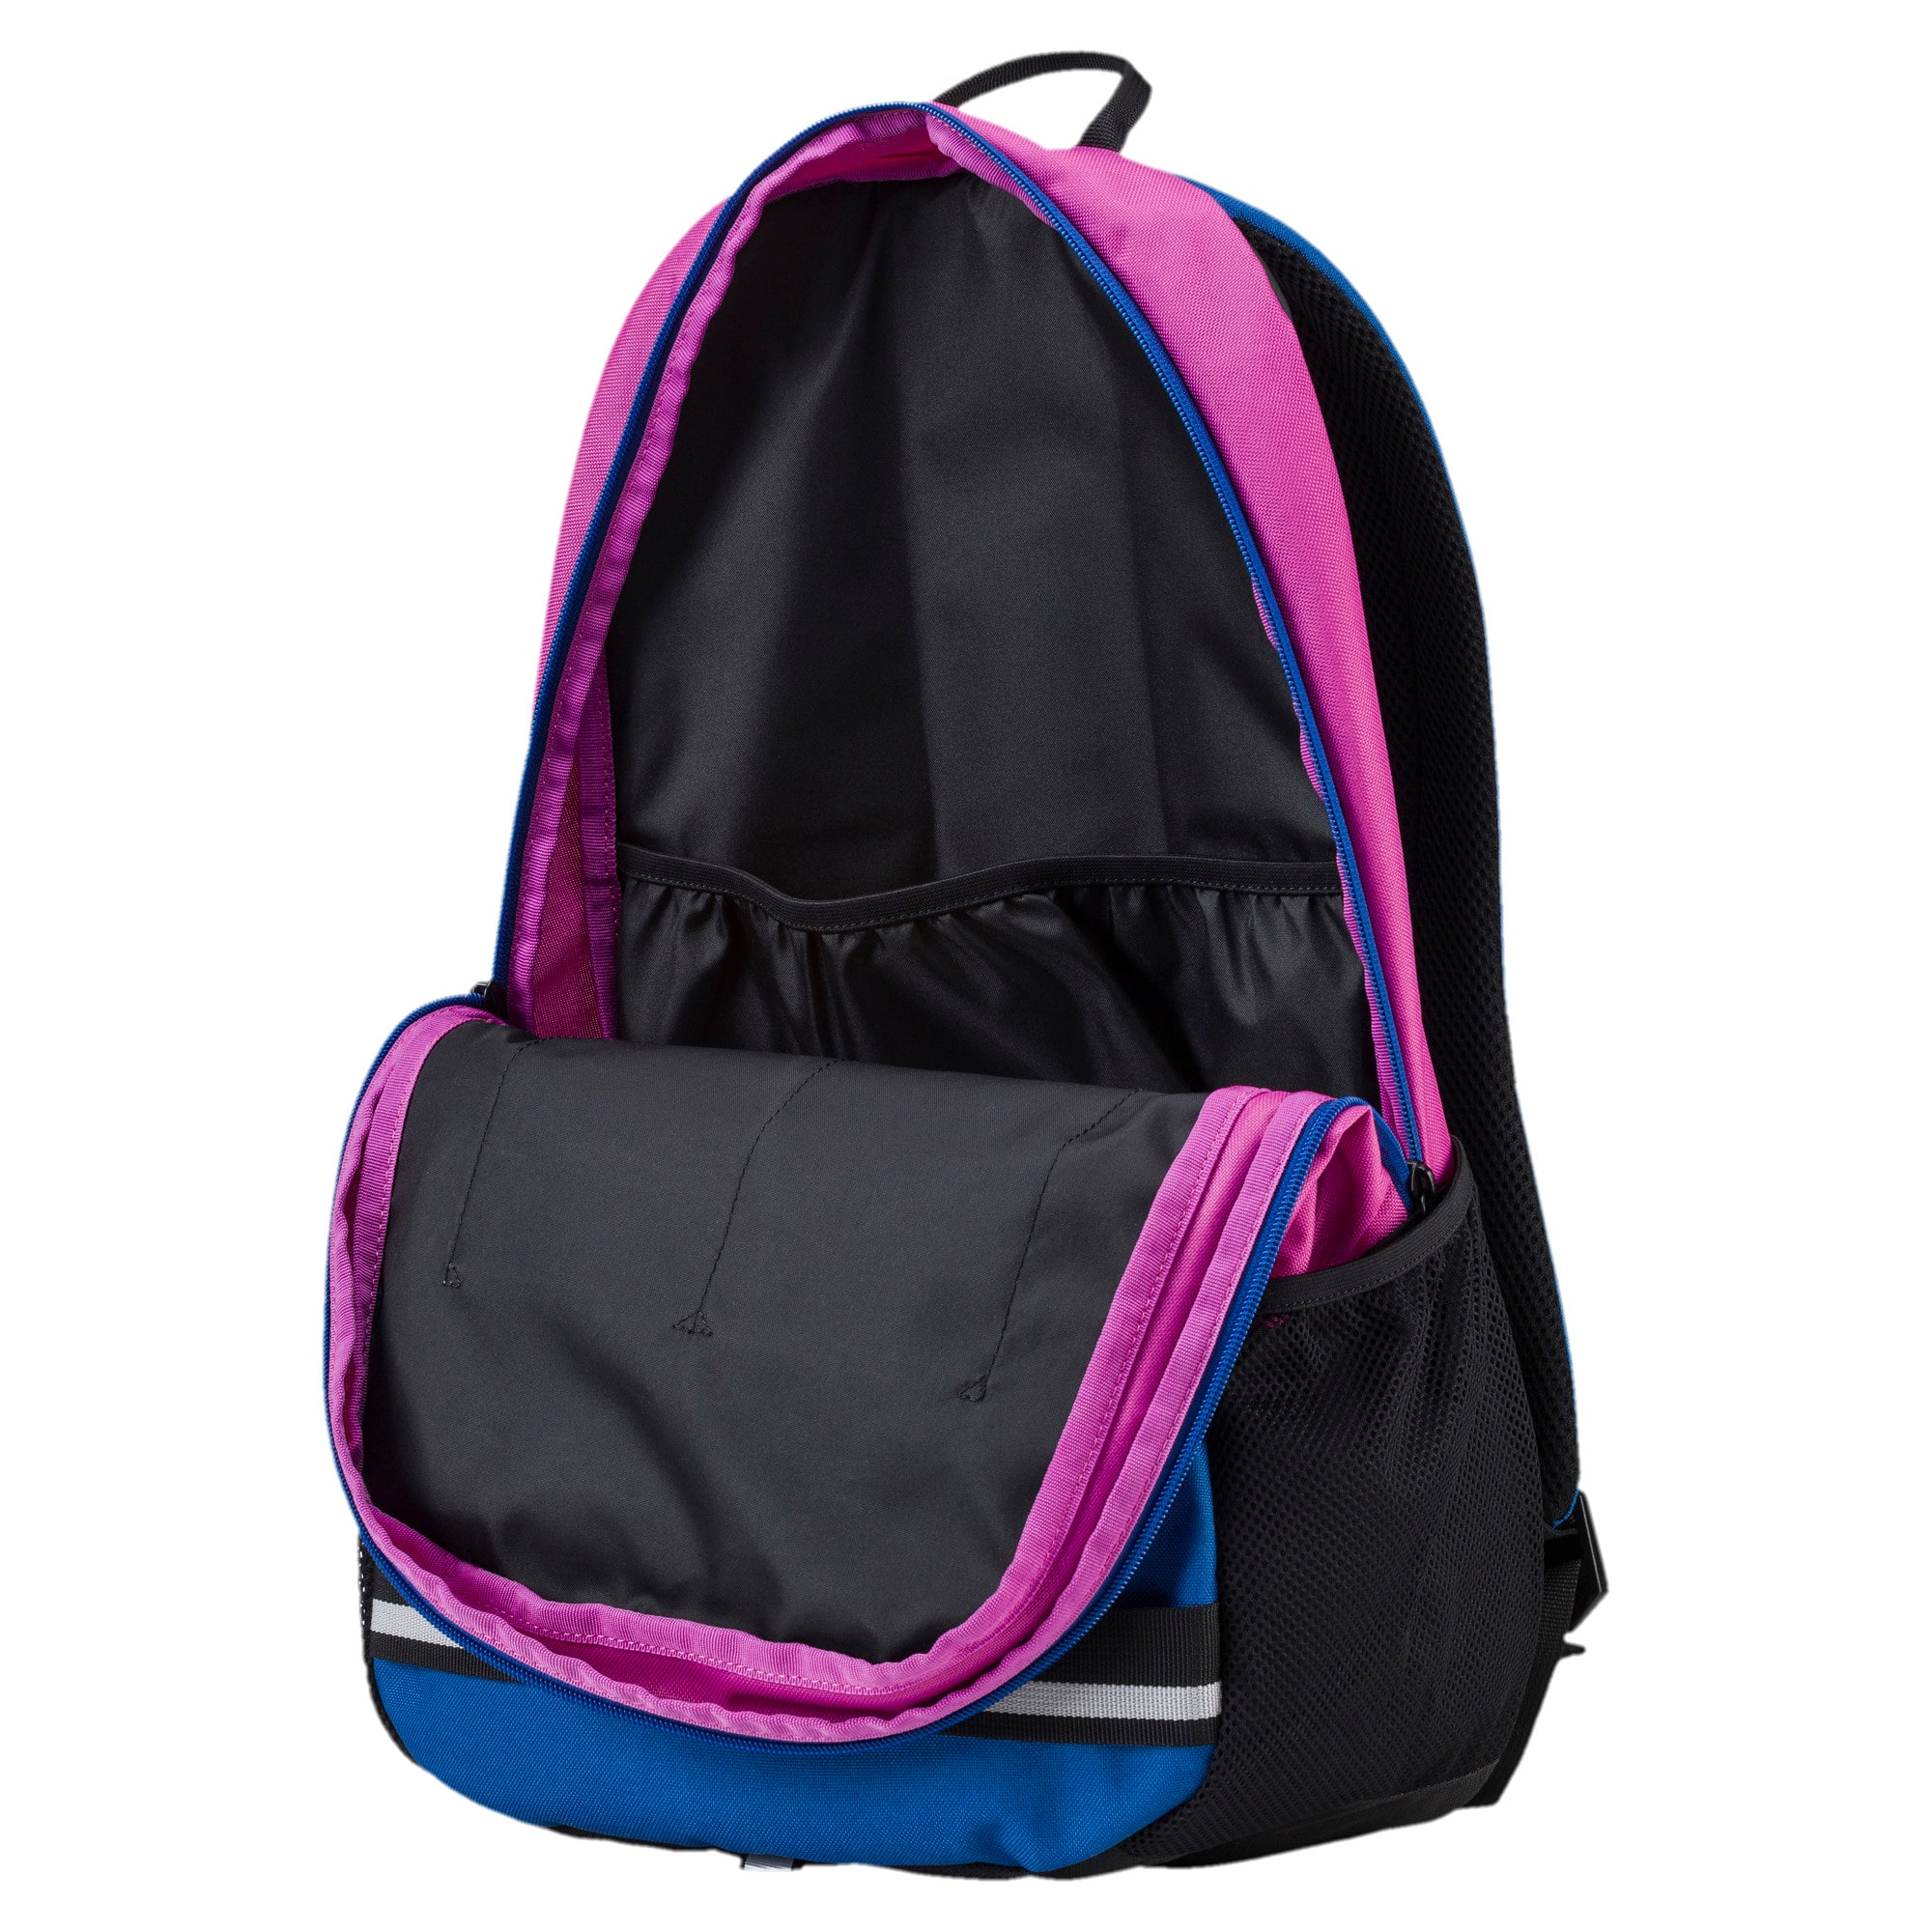 Thumbnail 3 of PUMA Deck Backpack, Rose Violet-TRUE BLUE, medium-IND